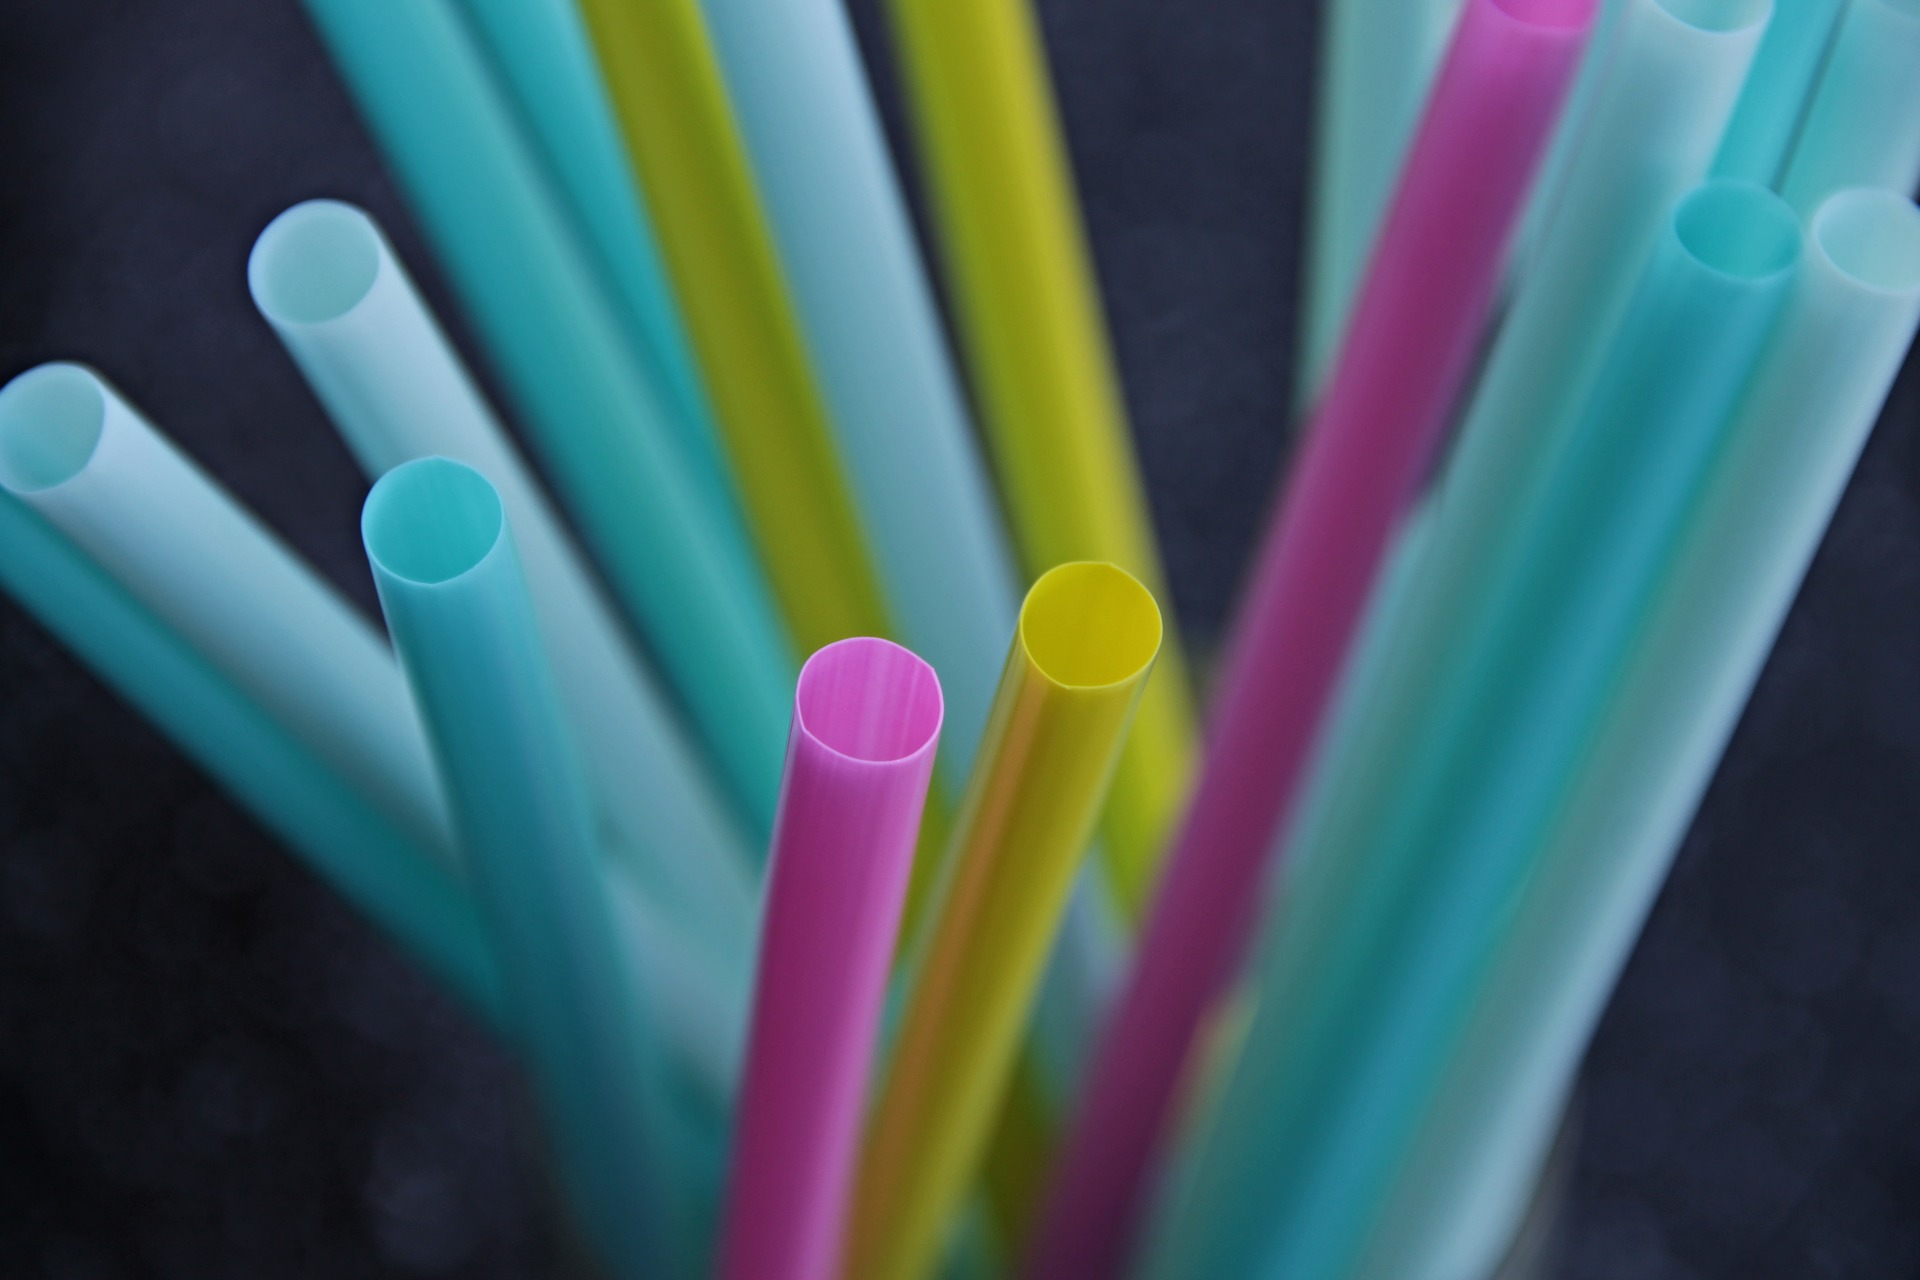 straws-3193715_1920.jpg